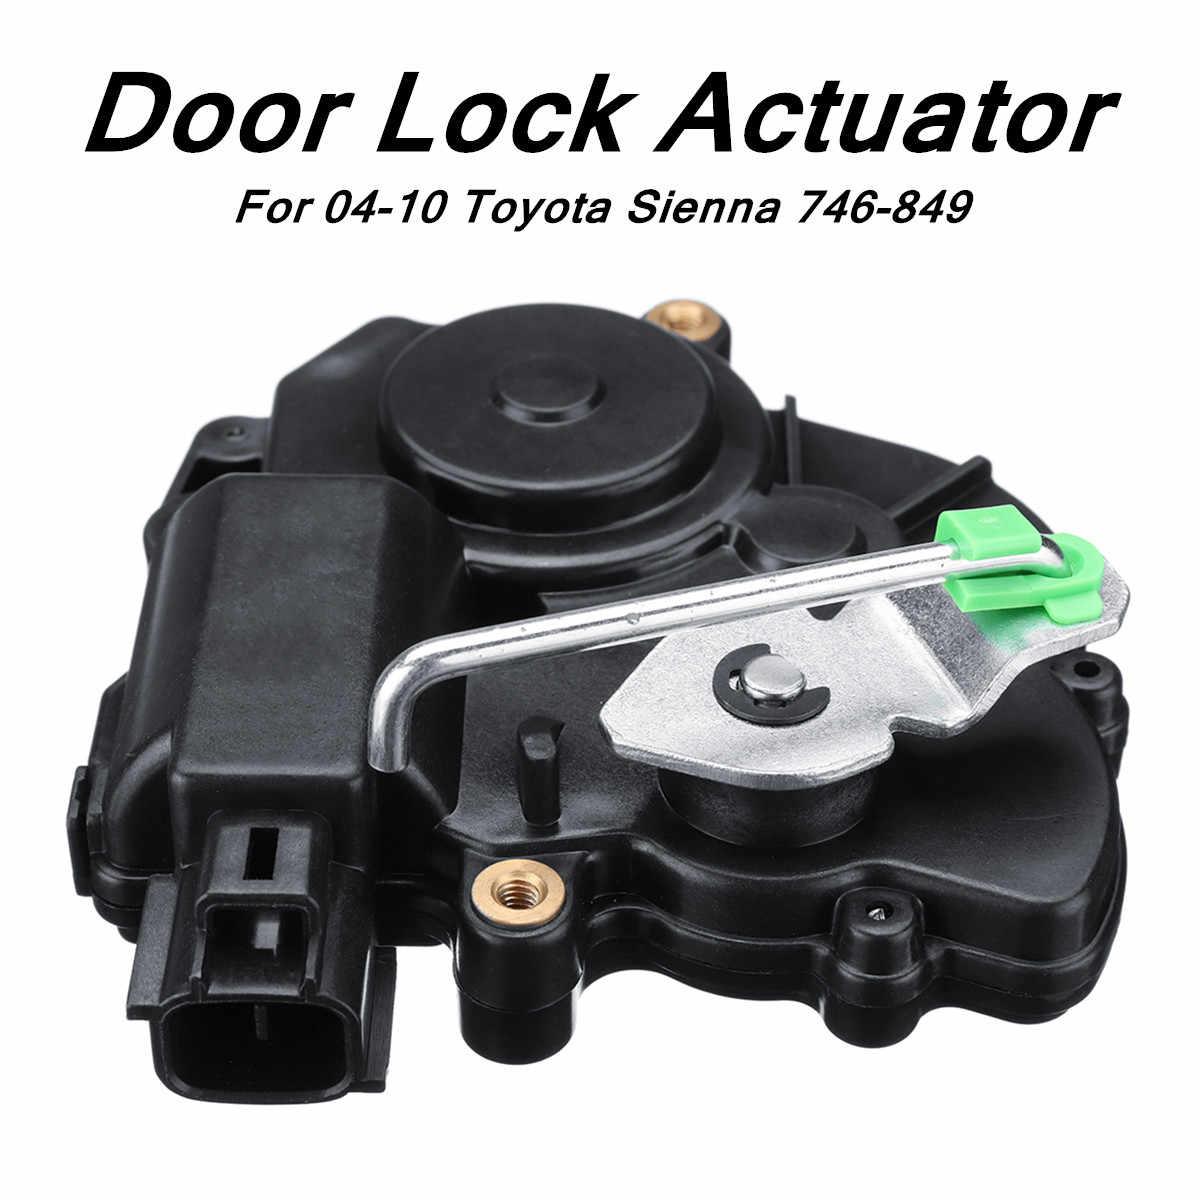 Door Lock Actuator Motor Right Side Sliding 746-849 For 2004-2010 Toyota Sienna